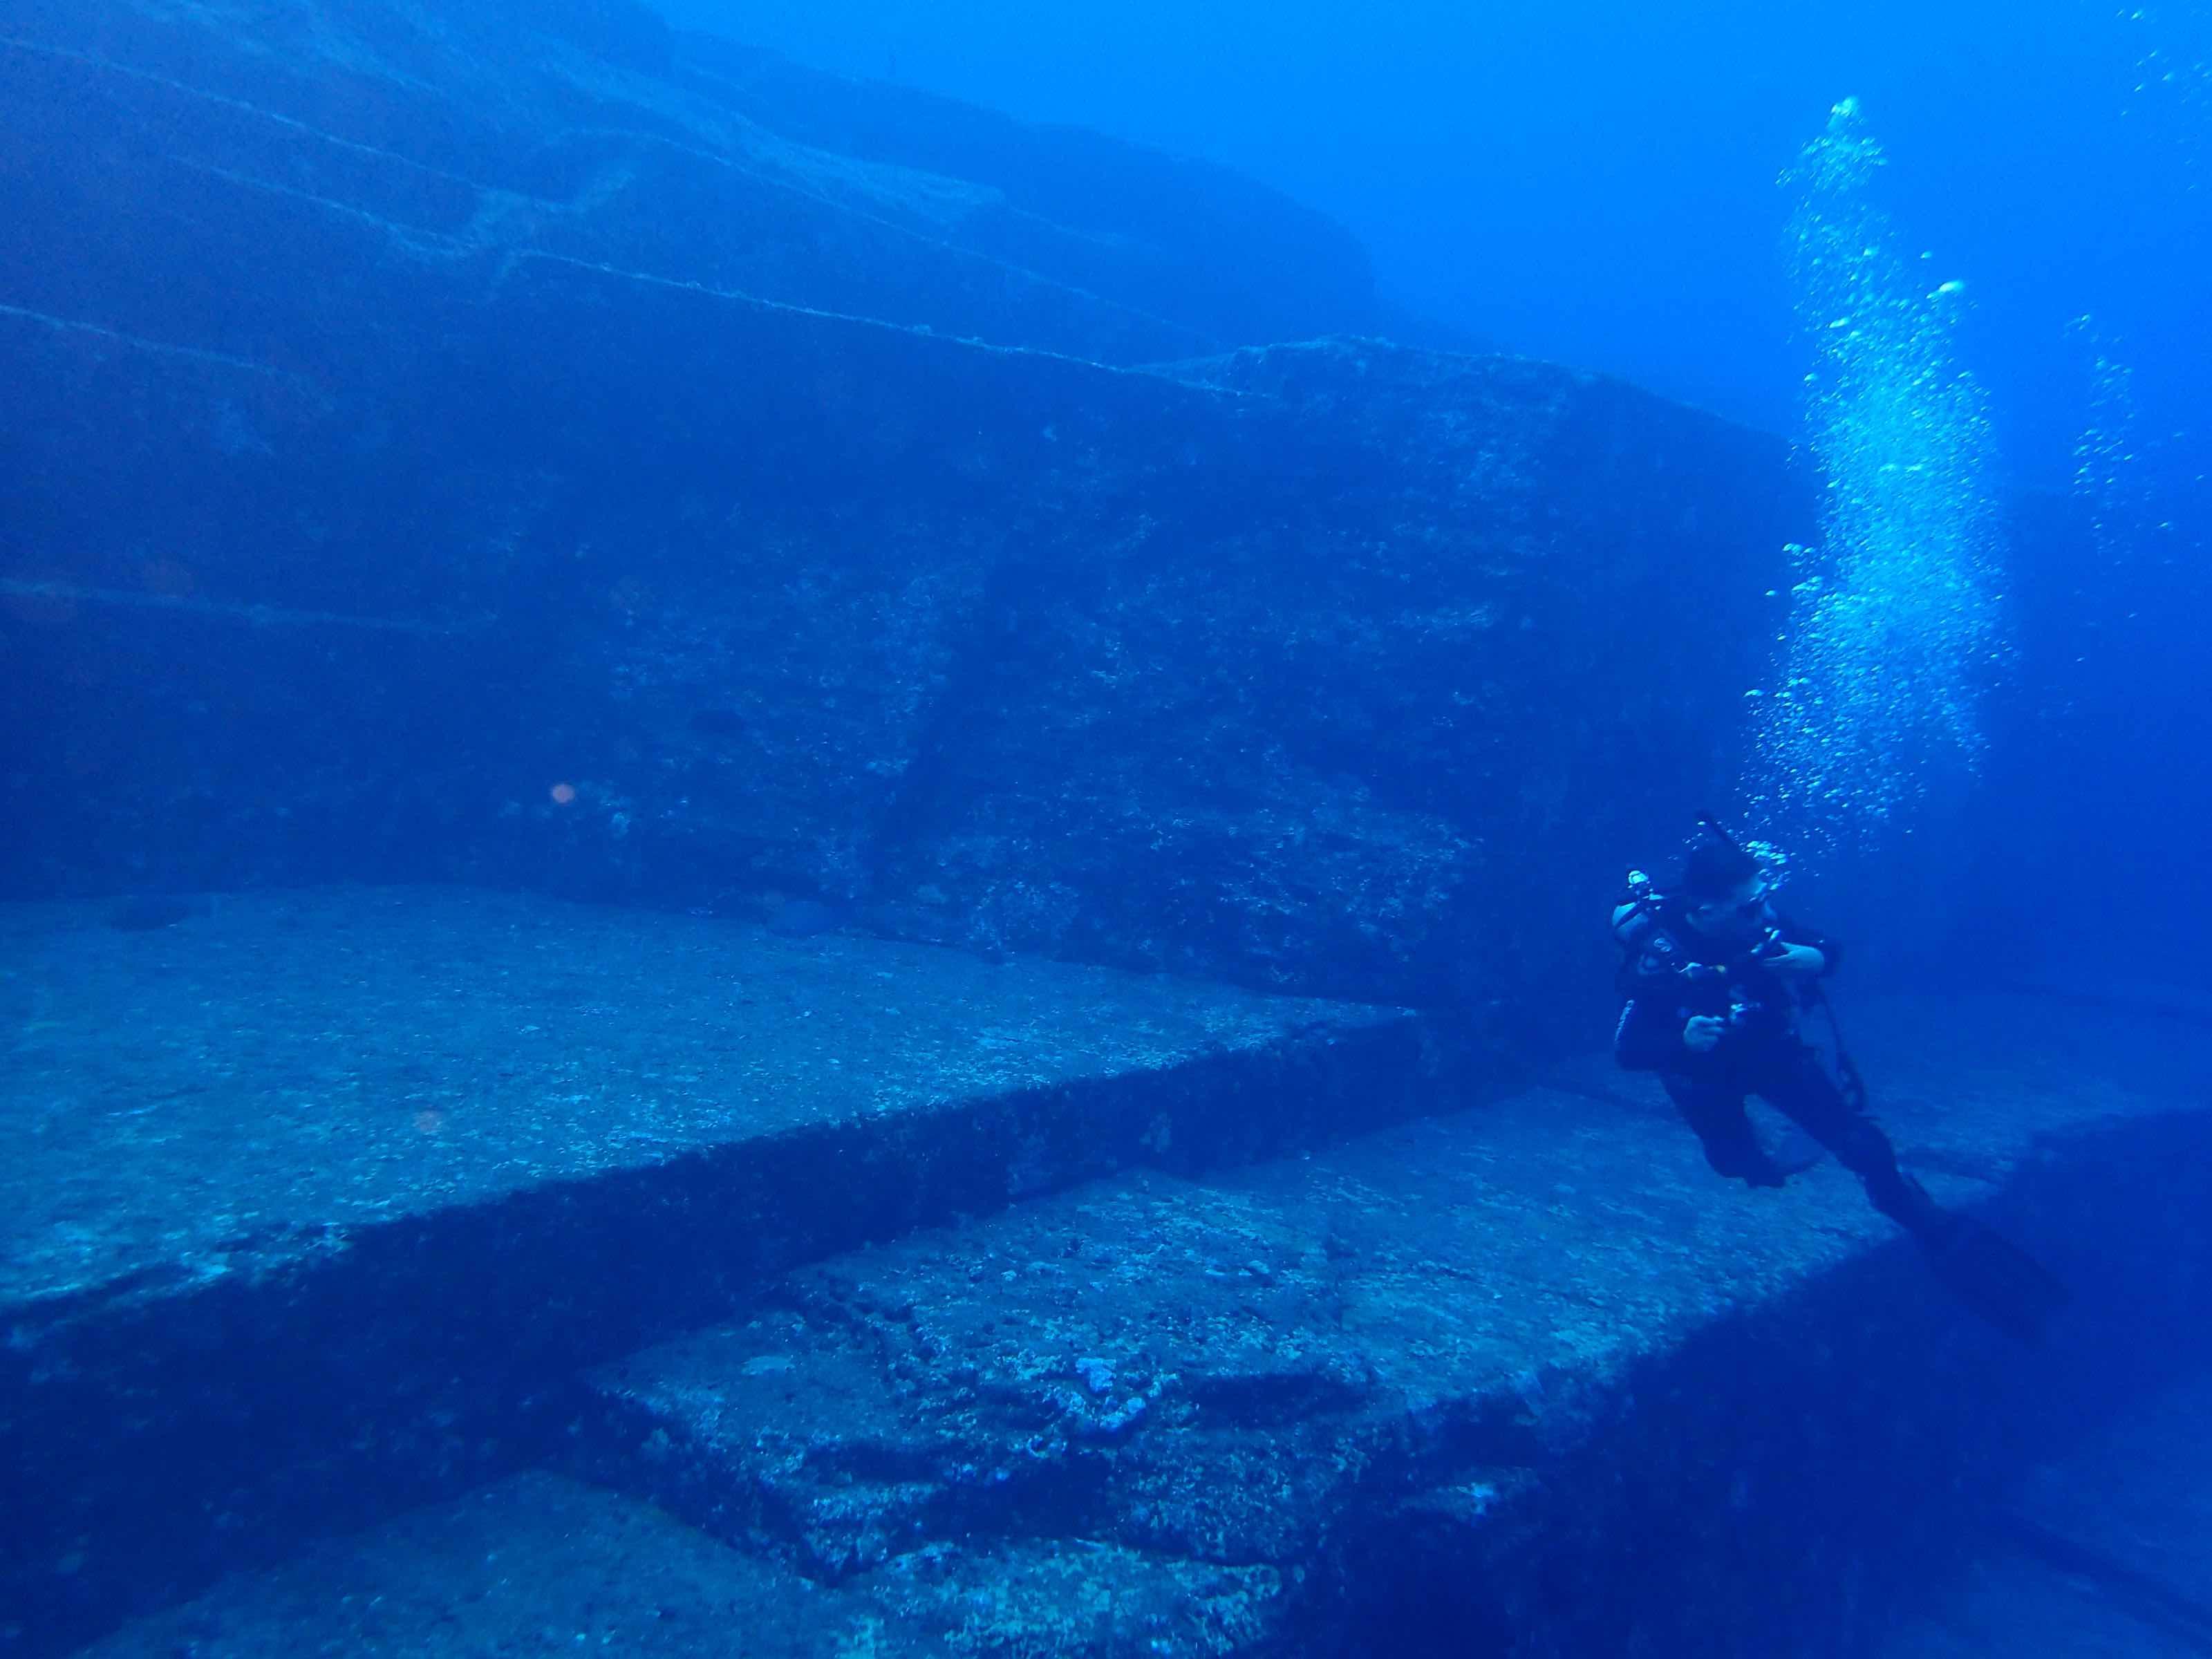 http://www.aquamarine-dive.net/blog/index.html/2018/11/17/PB091352.jpg